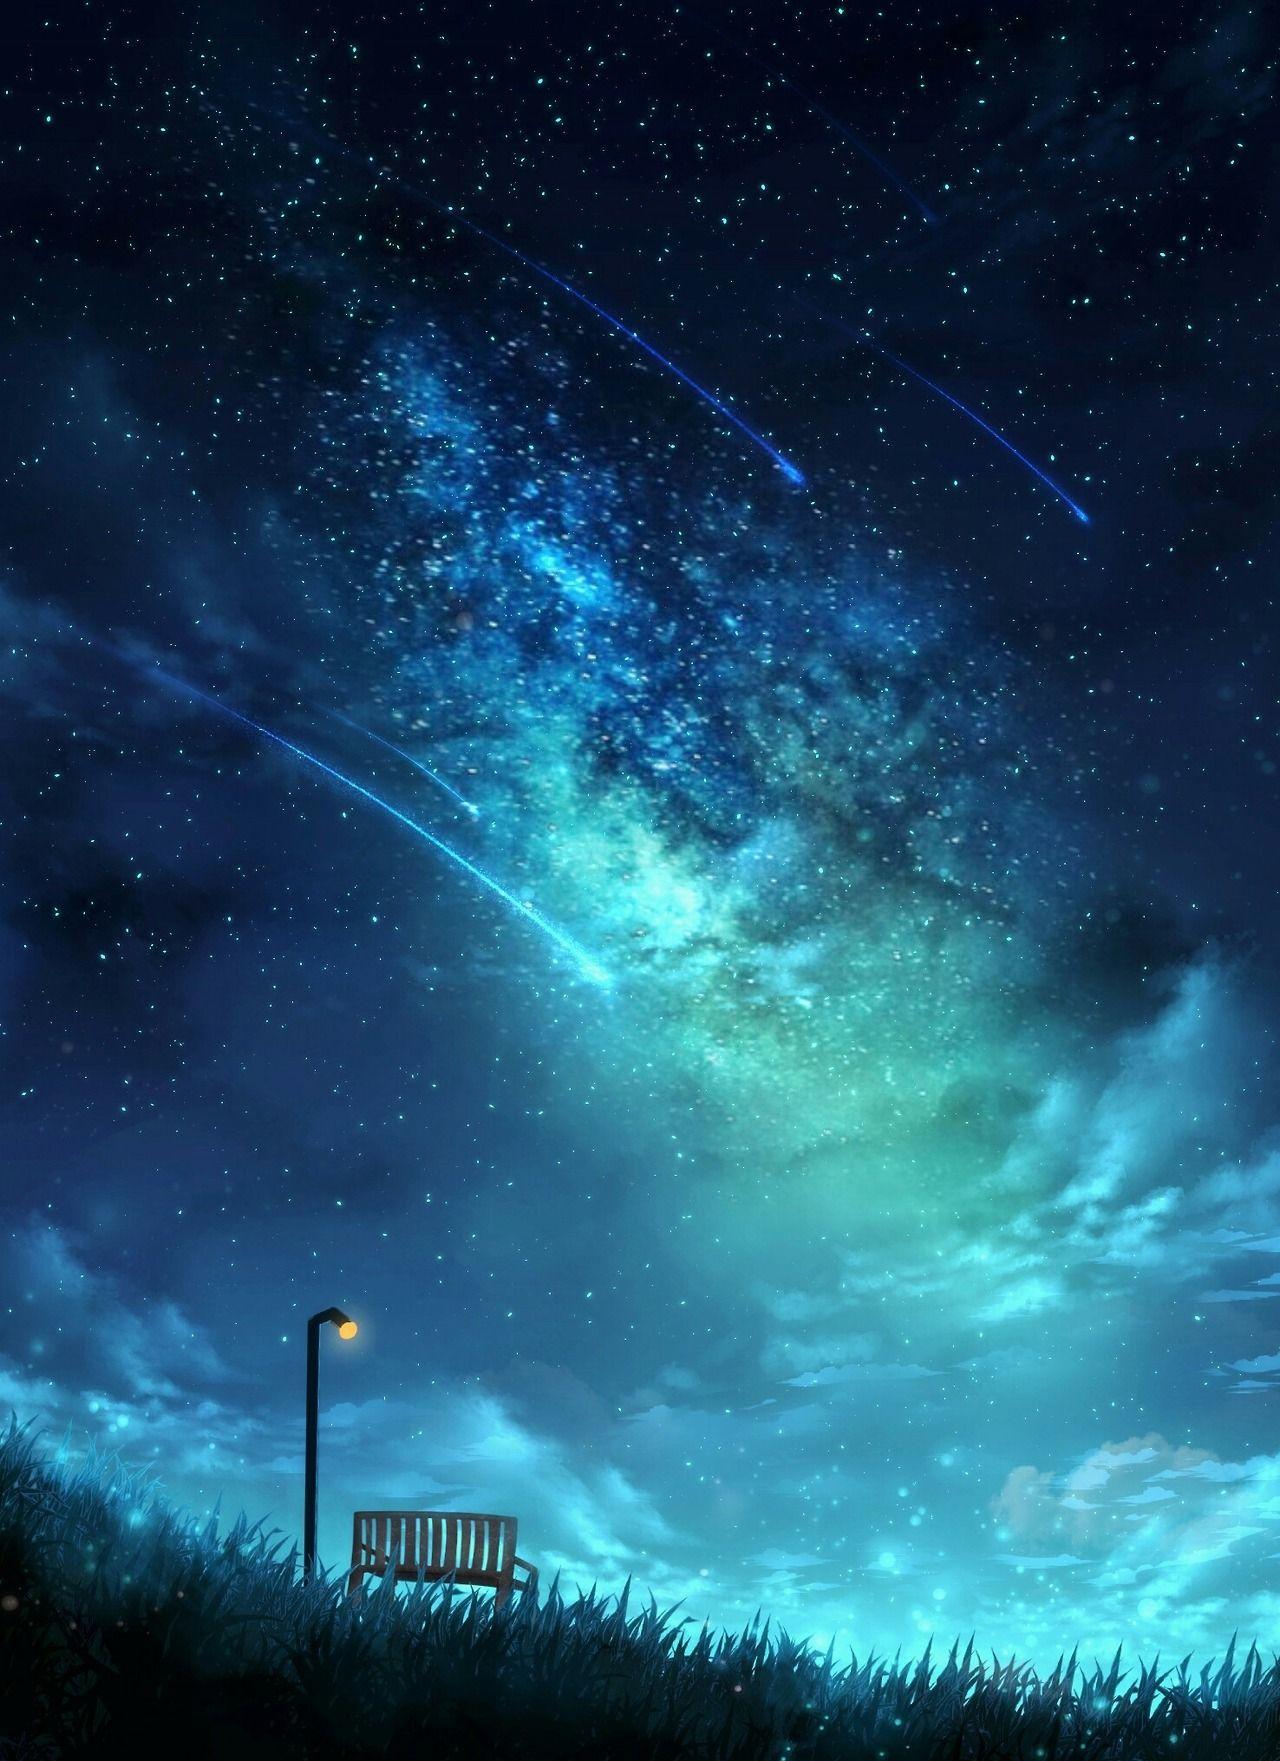 Bench under the starry sky Latar belakang, Langit malam